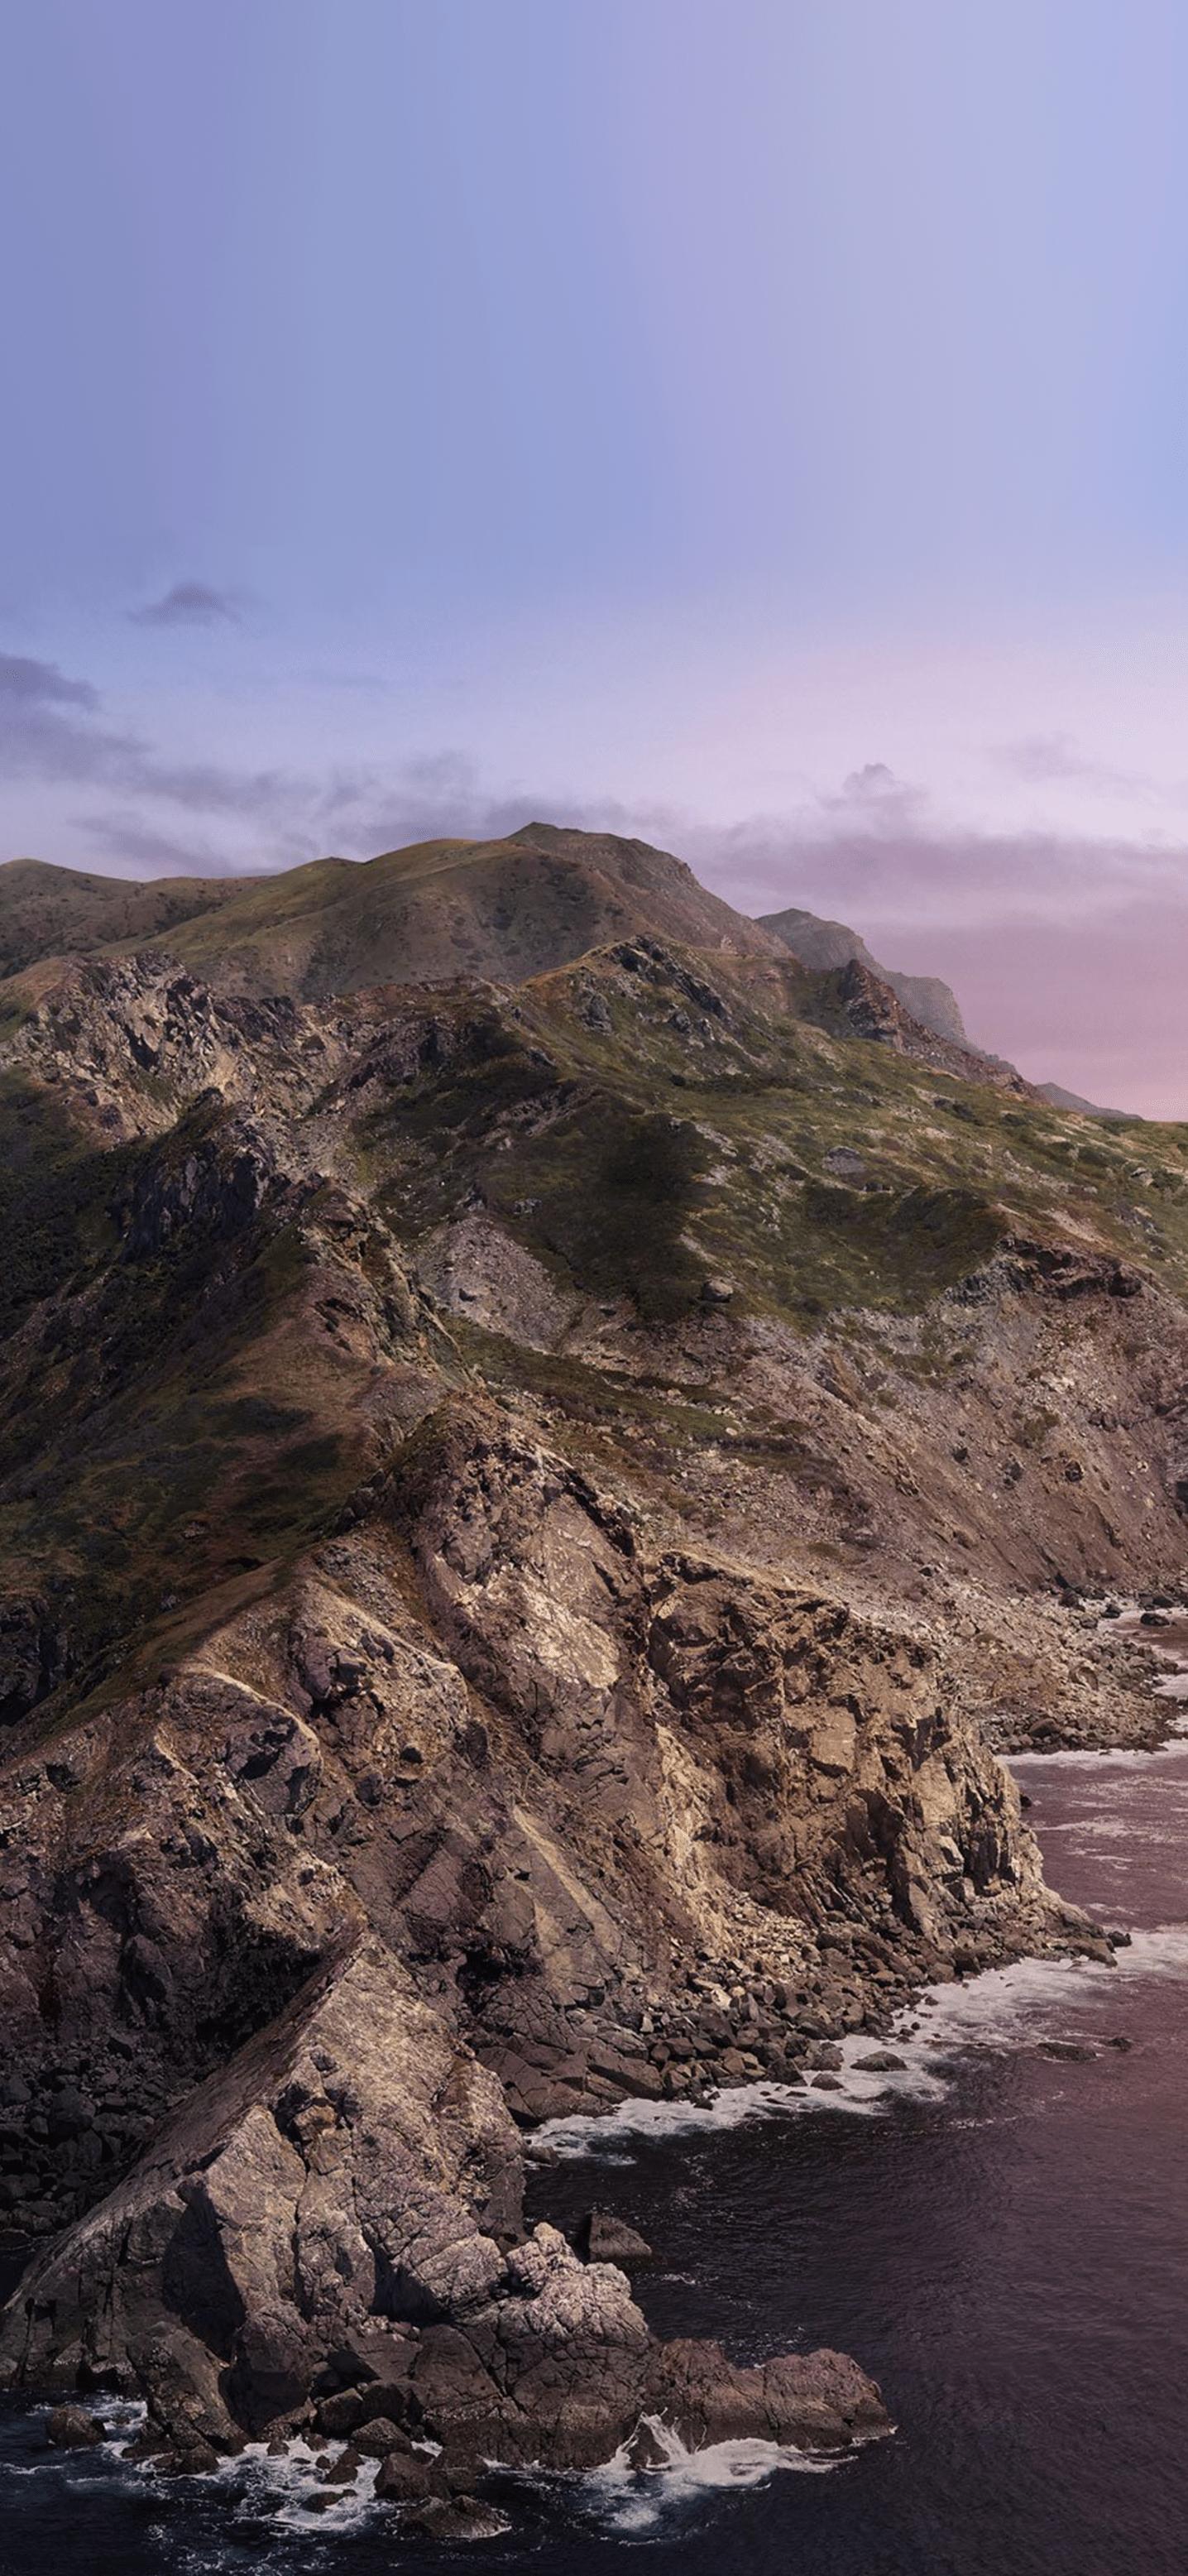 Macos Catalina Wallpapers Top Free Macos Catalina Backgrounds Wallpaperaccess